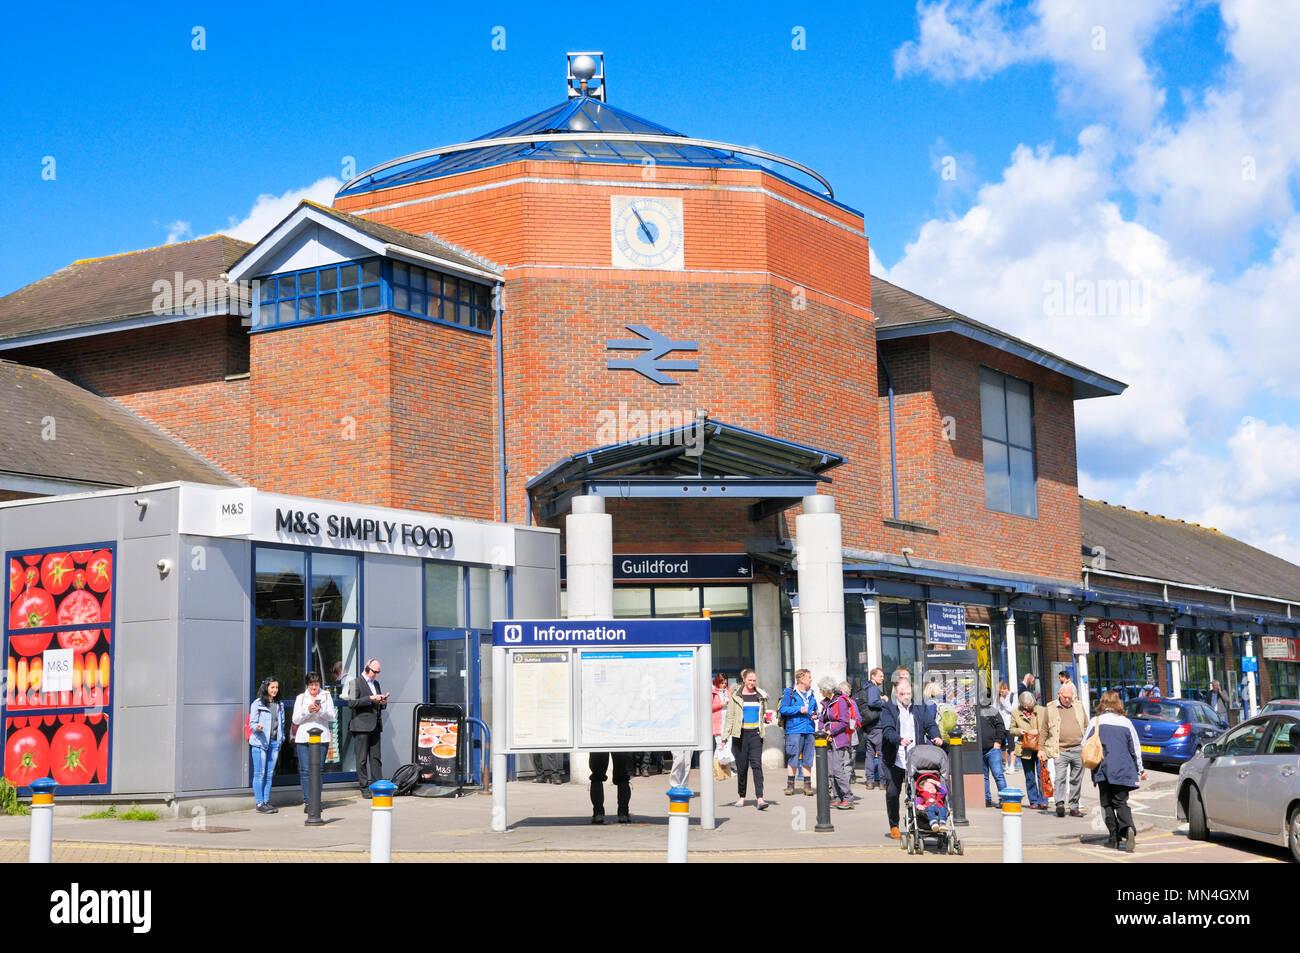 Guildford train station, Surrey, England, UK - Stock Image